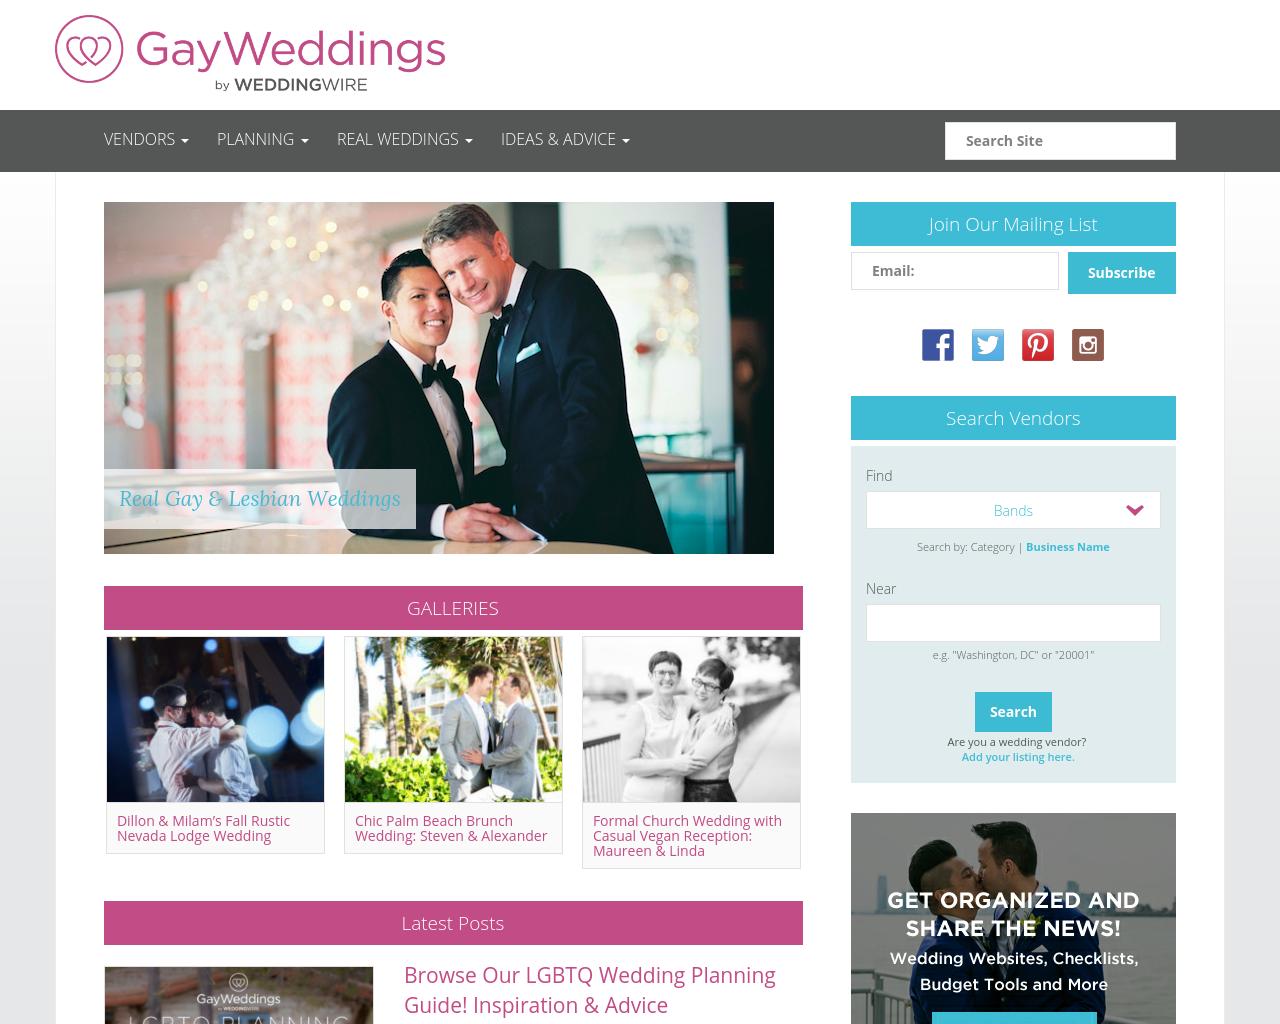 Gay-Weddings-Advertising-Reviews-Pricing